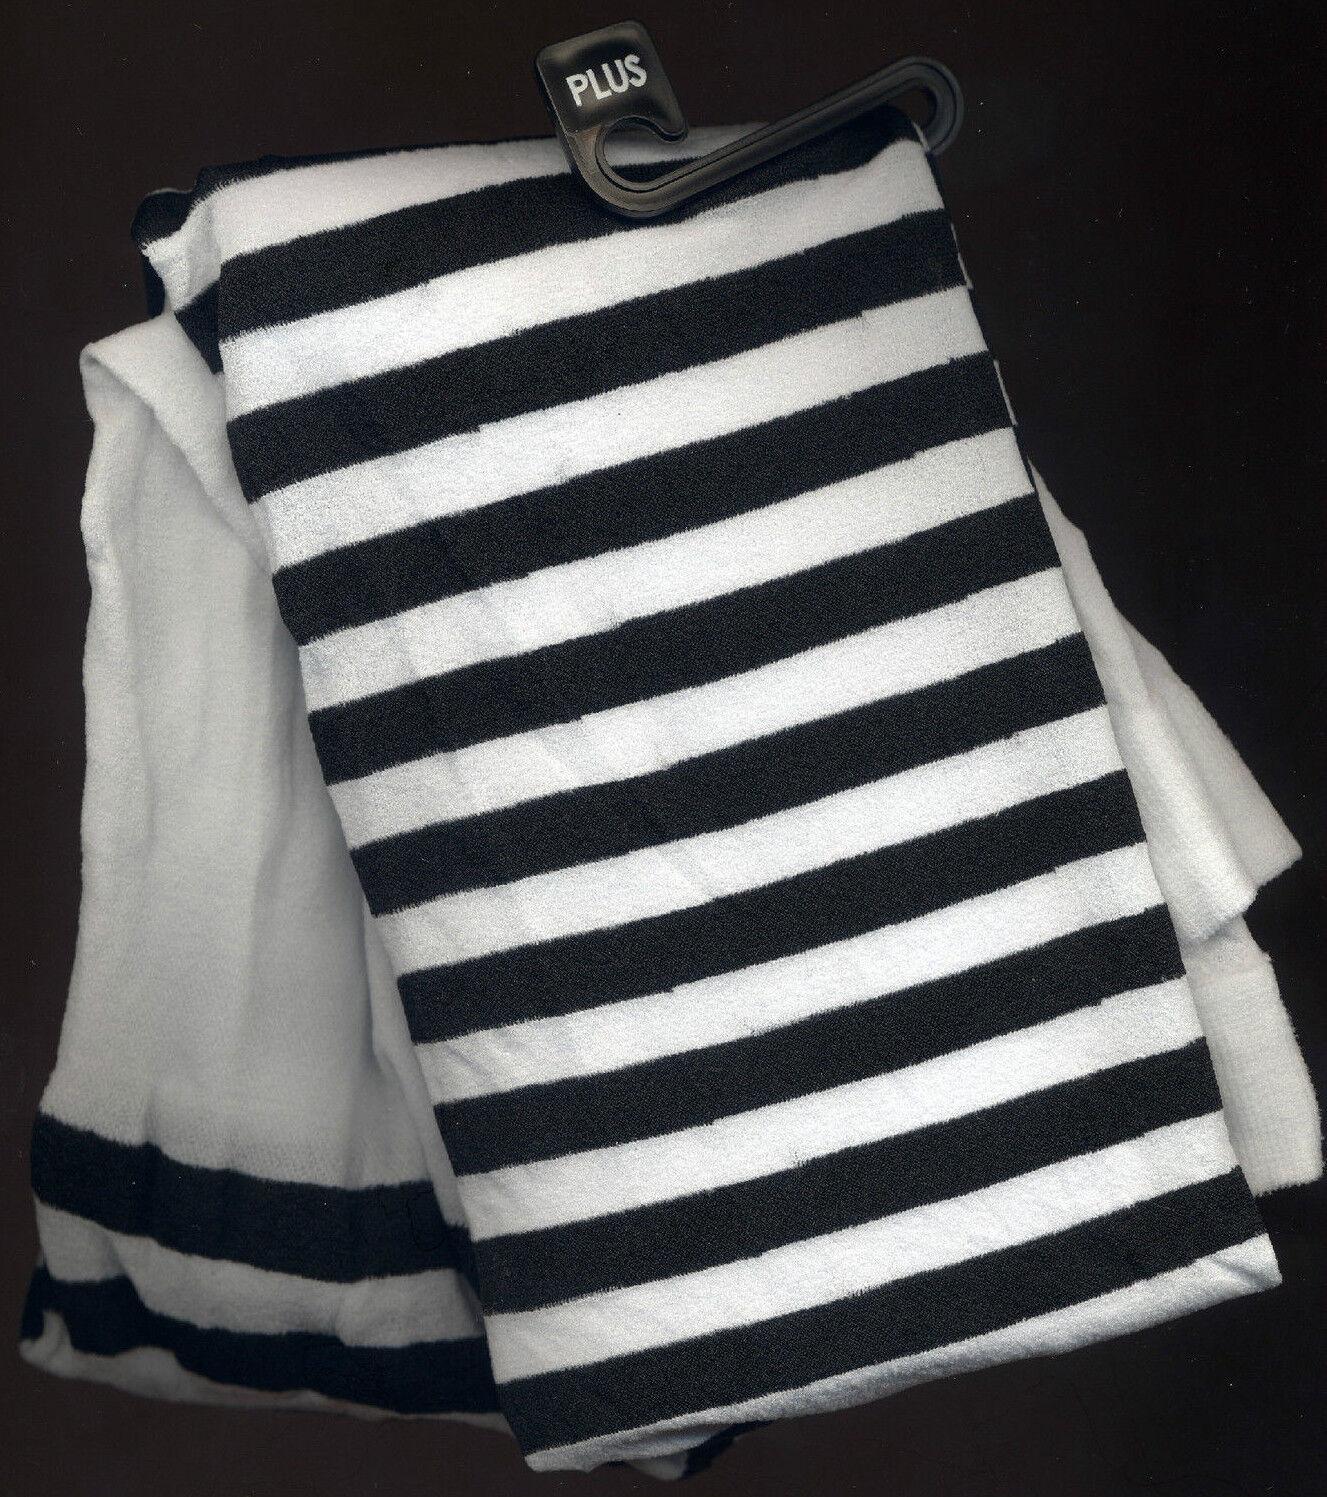 87fa89450 Купить Leg Avenue 7100 Q Opaque Striped Tights Plus на eBay.com из ...